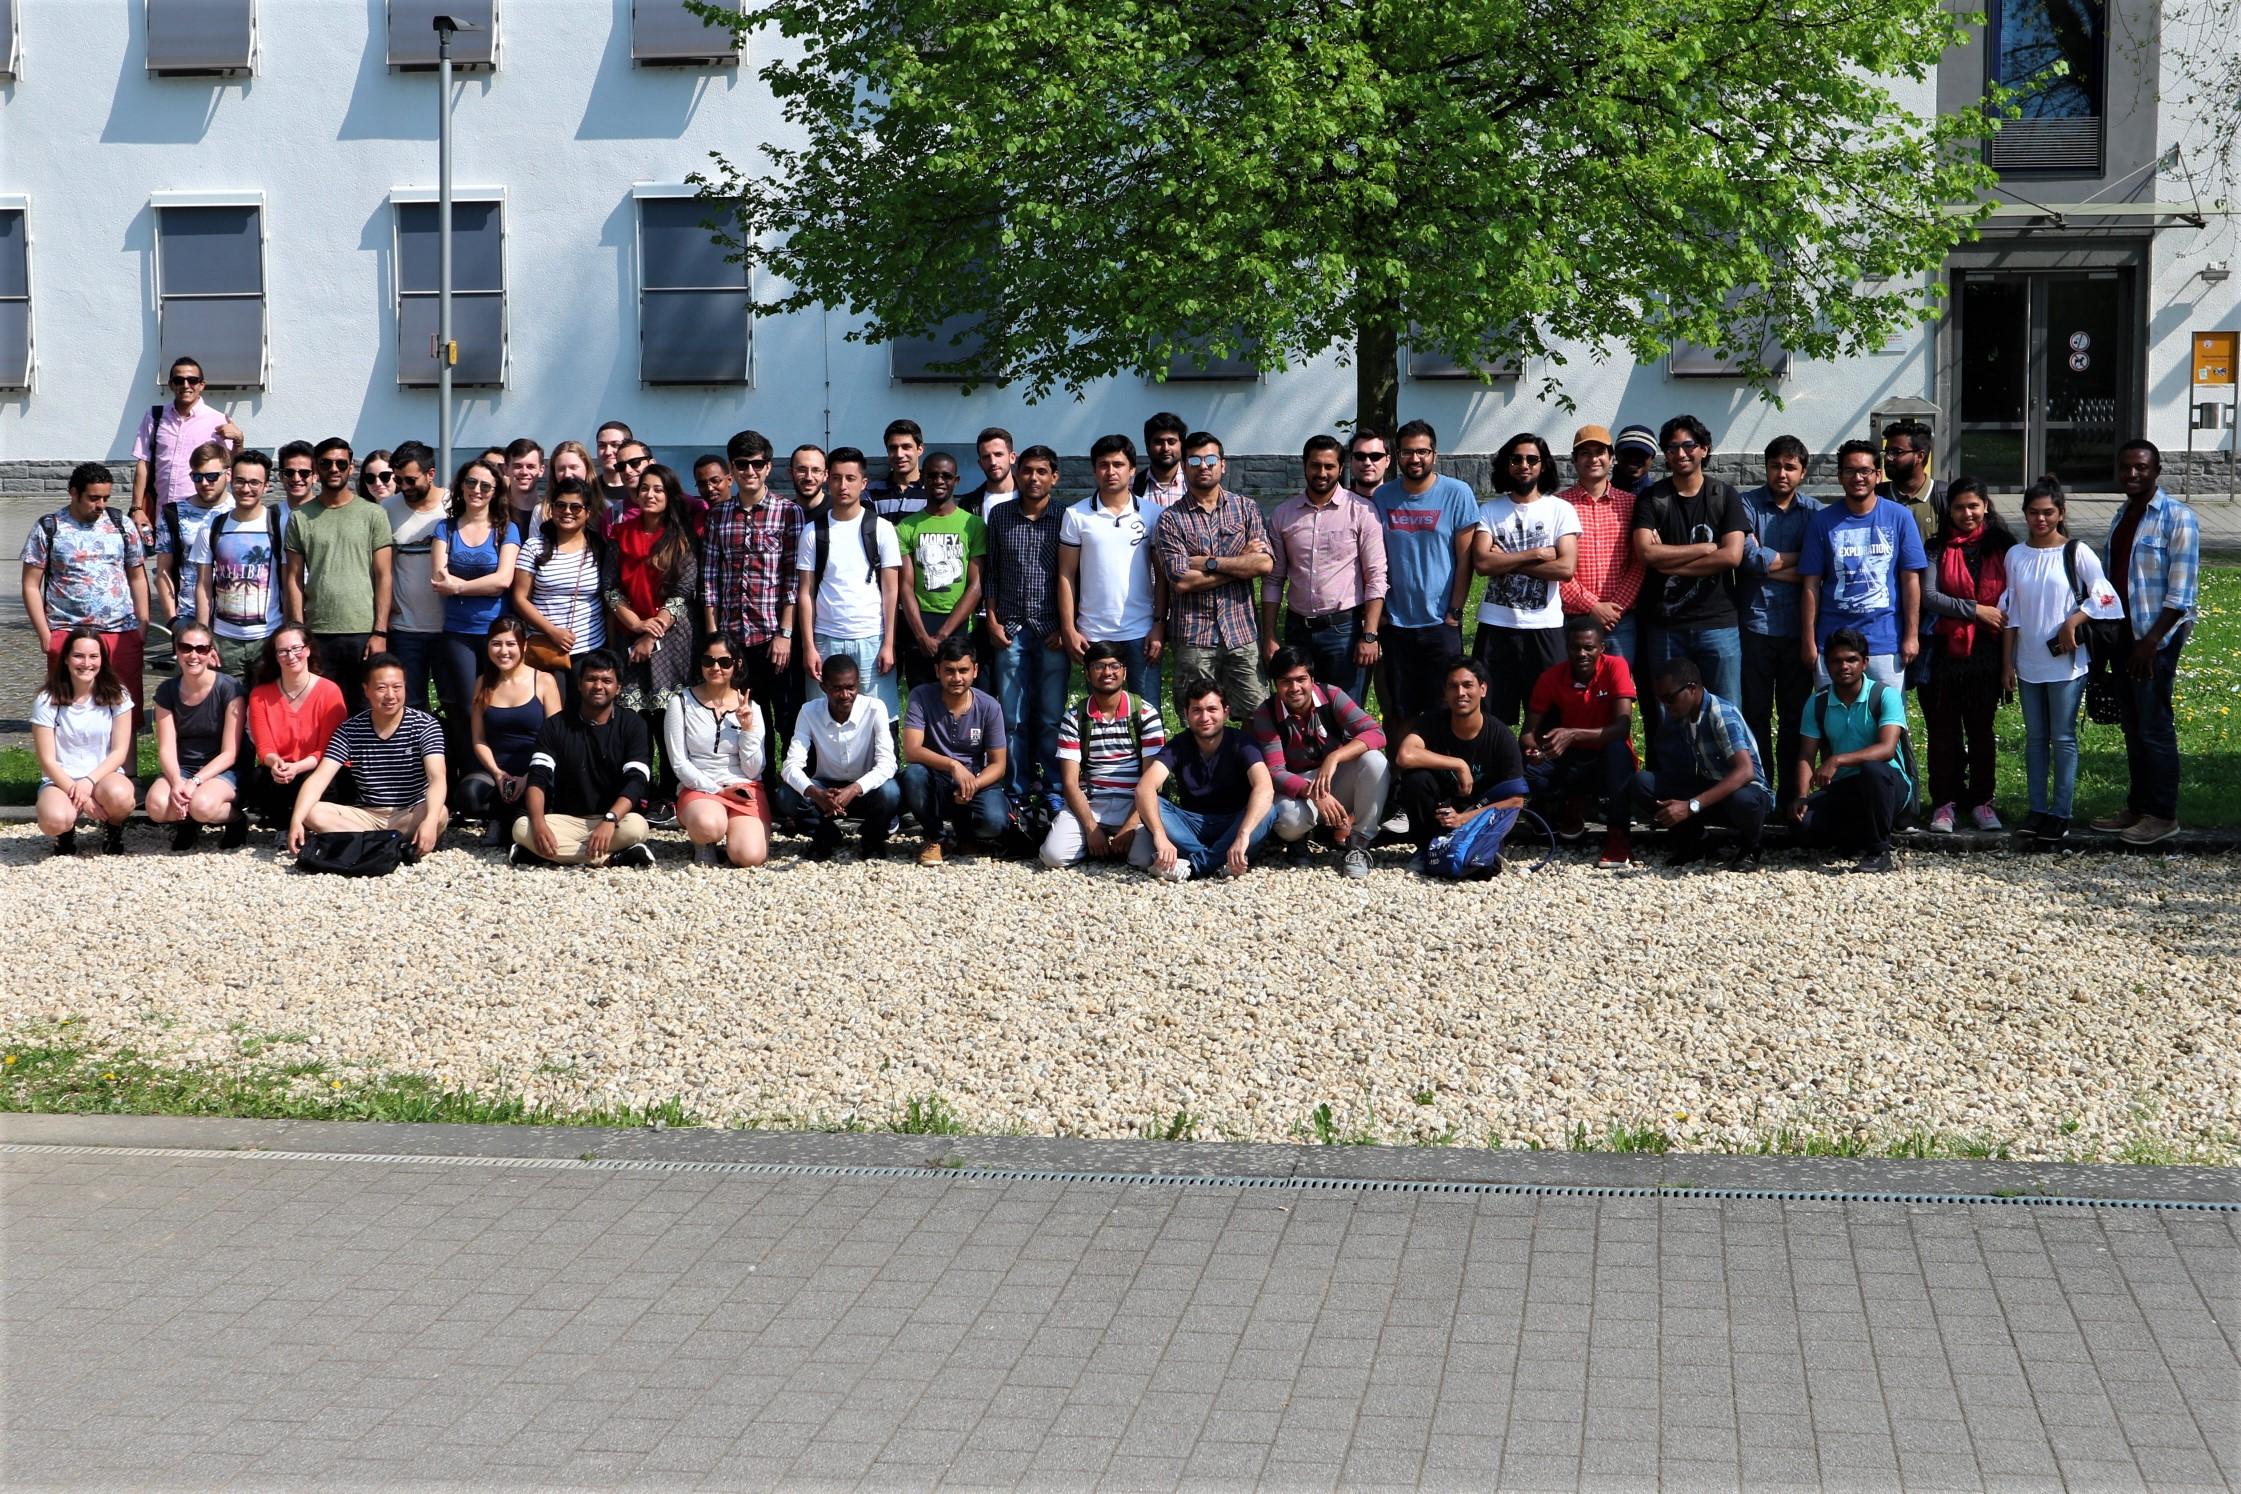 Universität Koblenz-Landau auch international beliebt